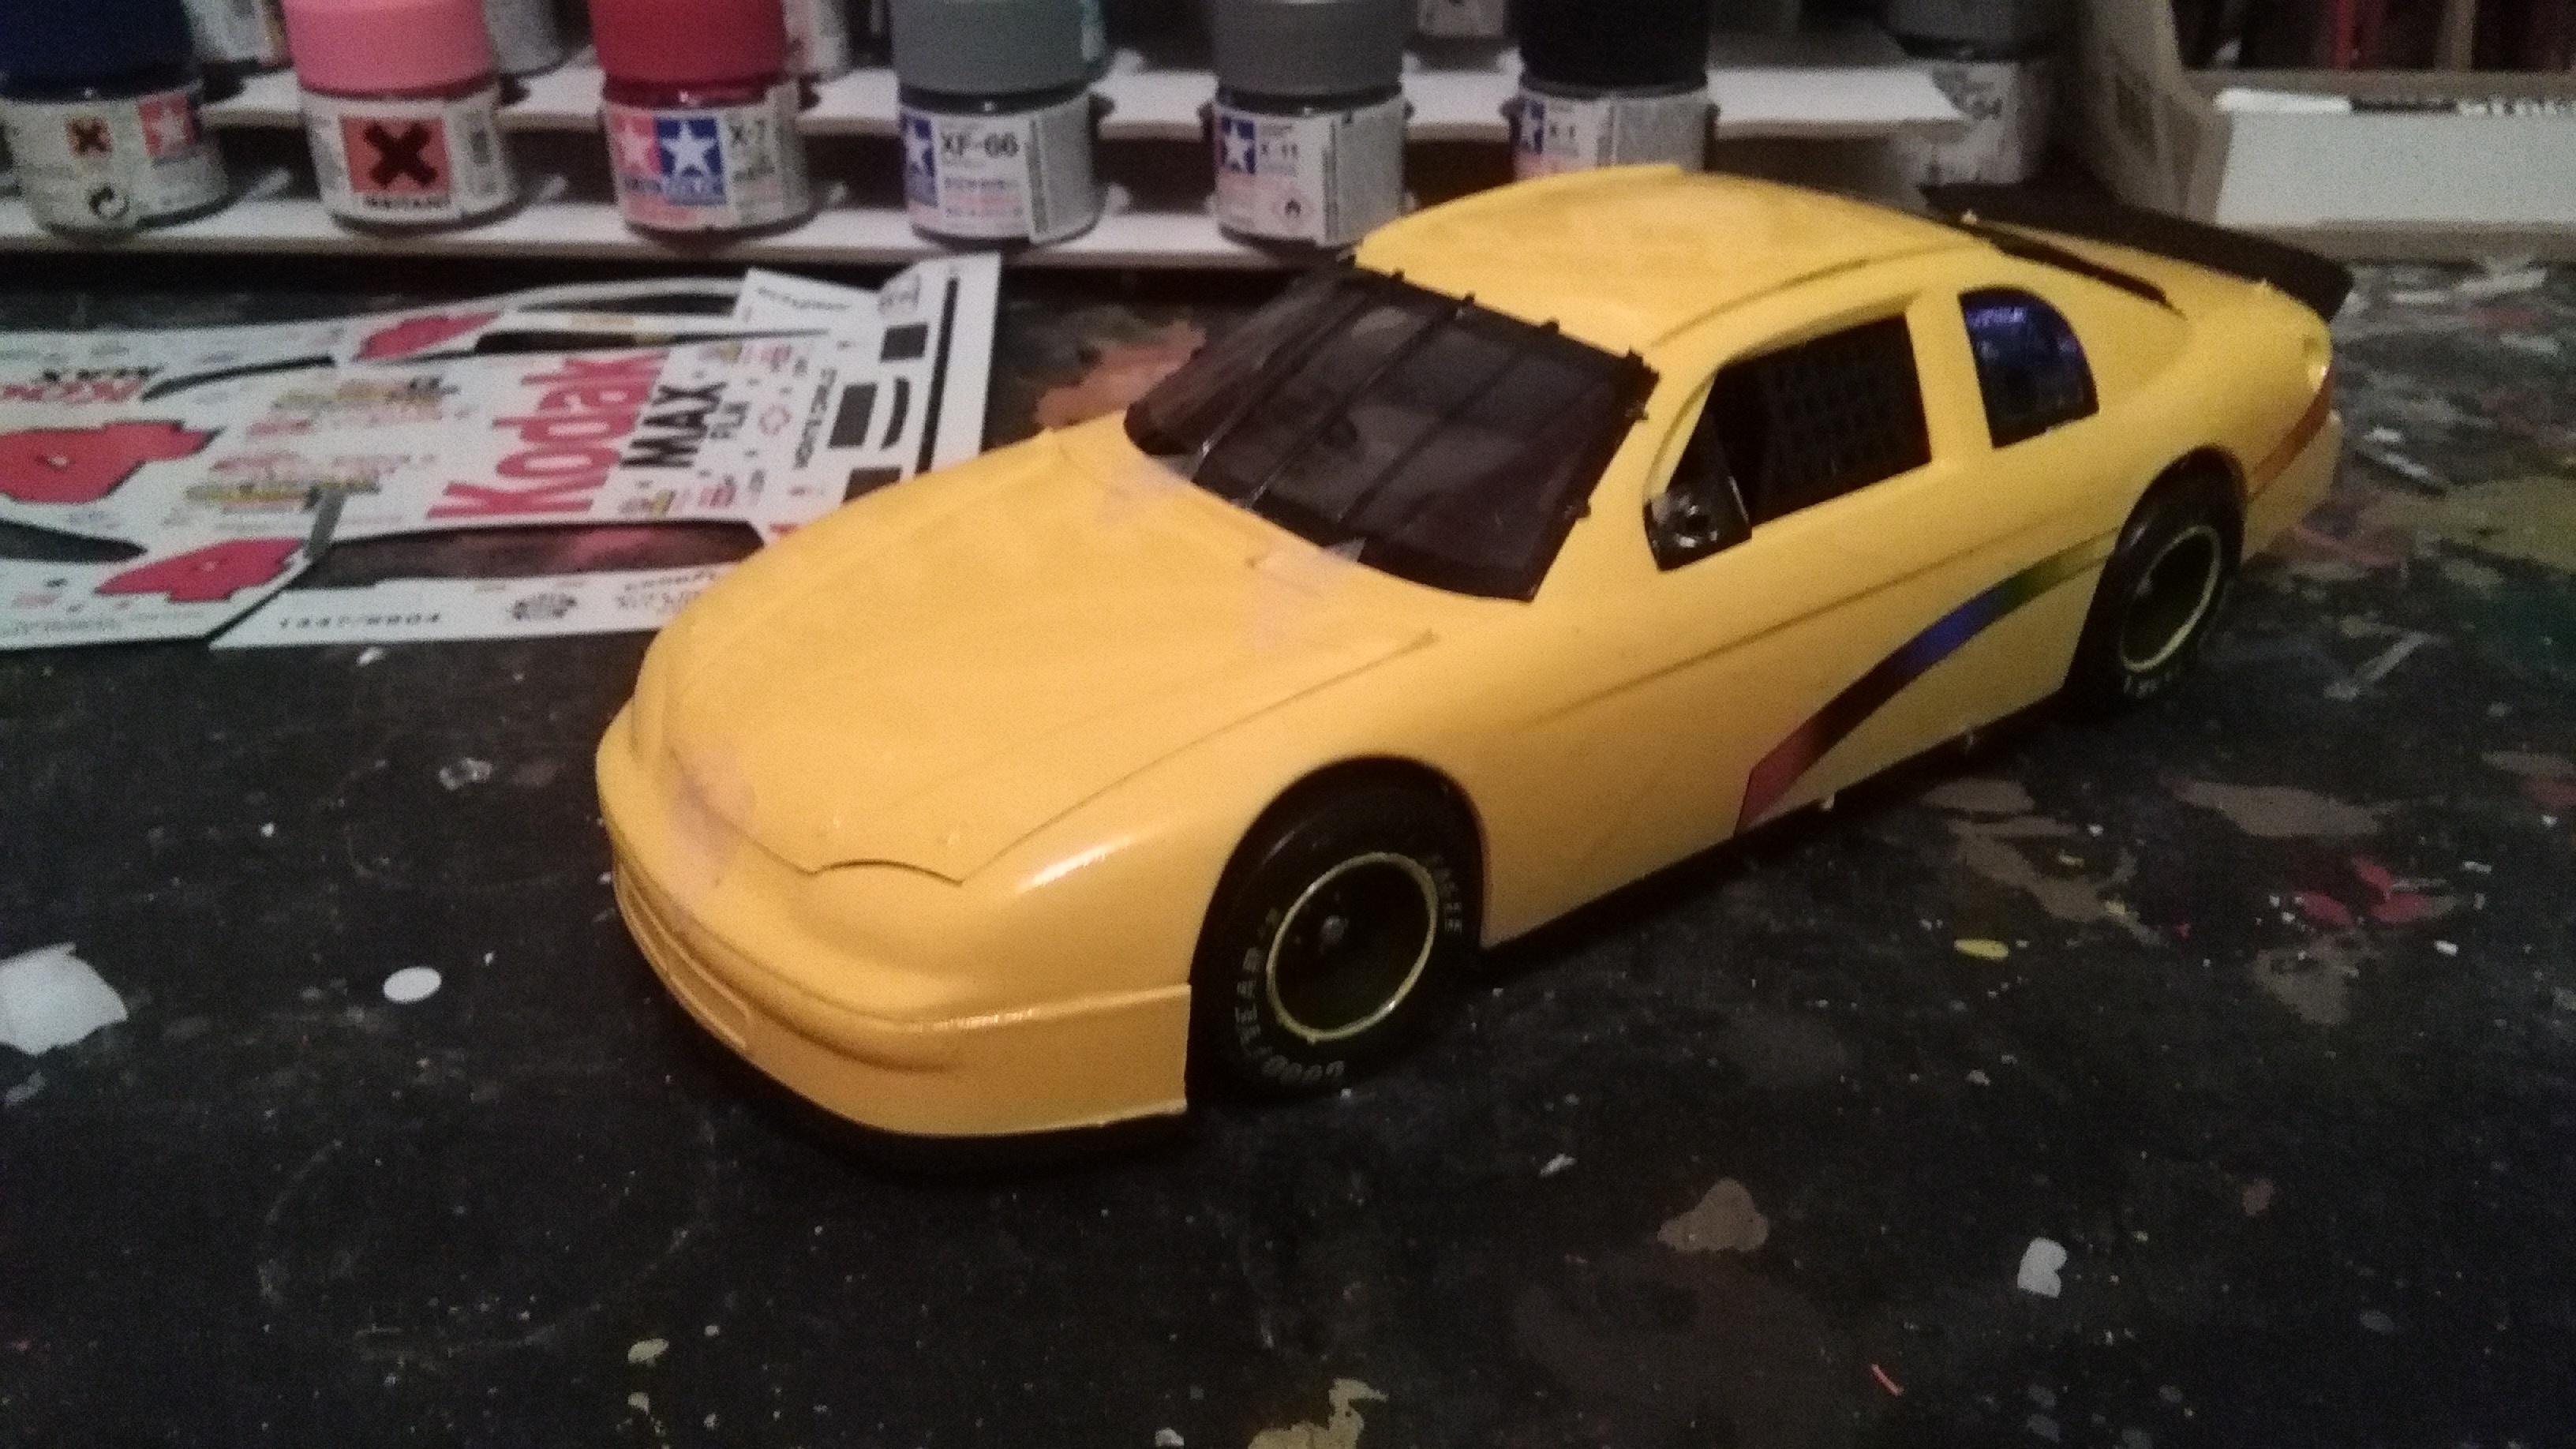 Chevy Monte-Carlo 1998 #4 Bobby Hamilton Kodak  297920C1998418